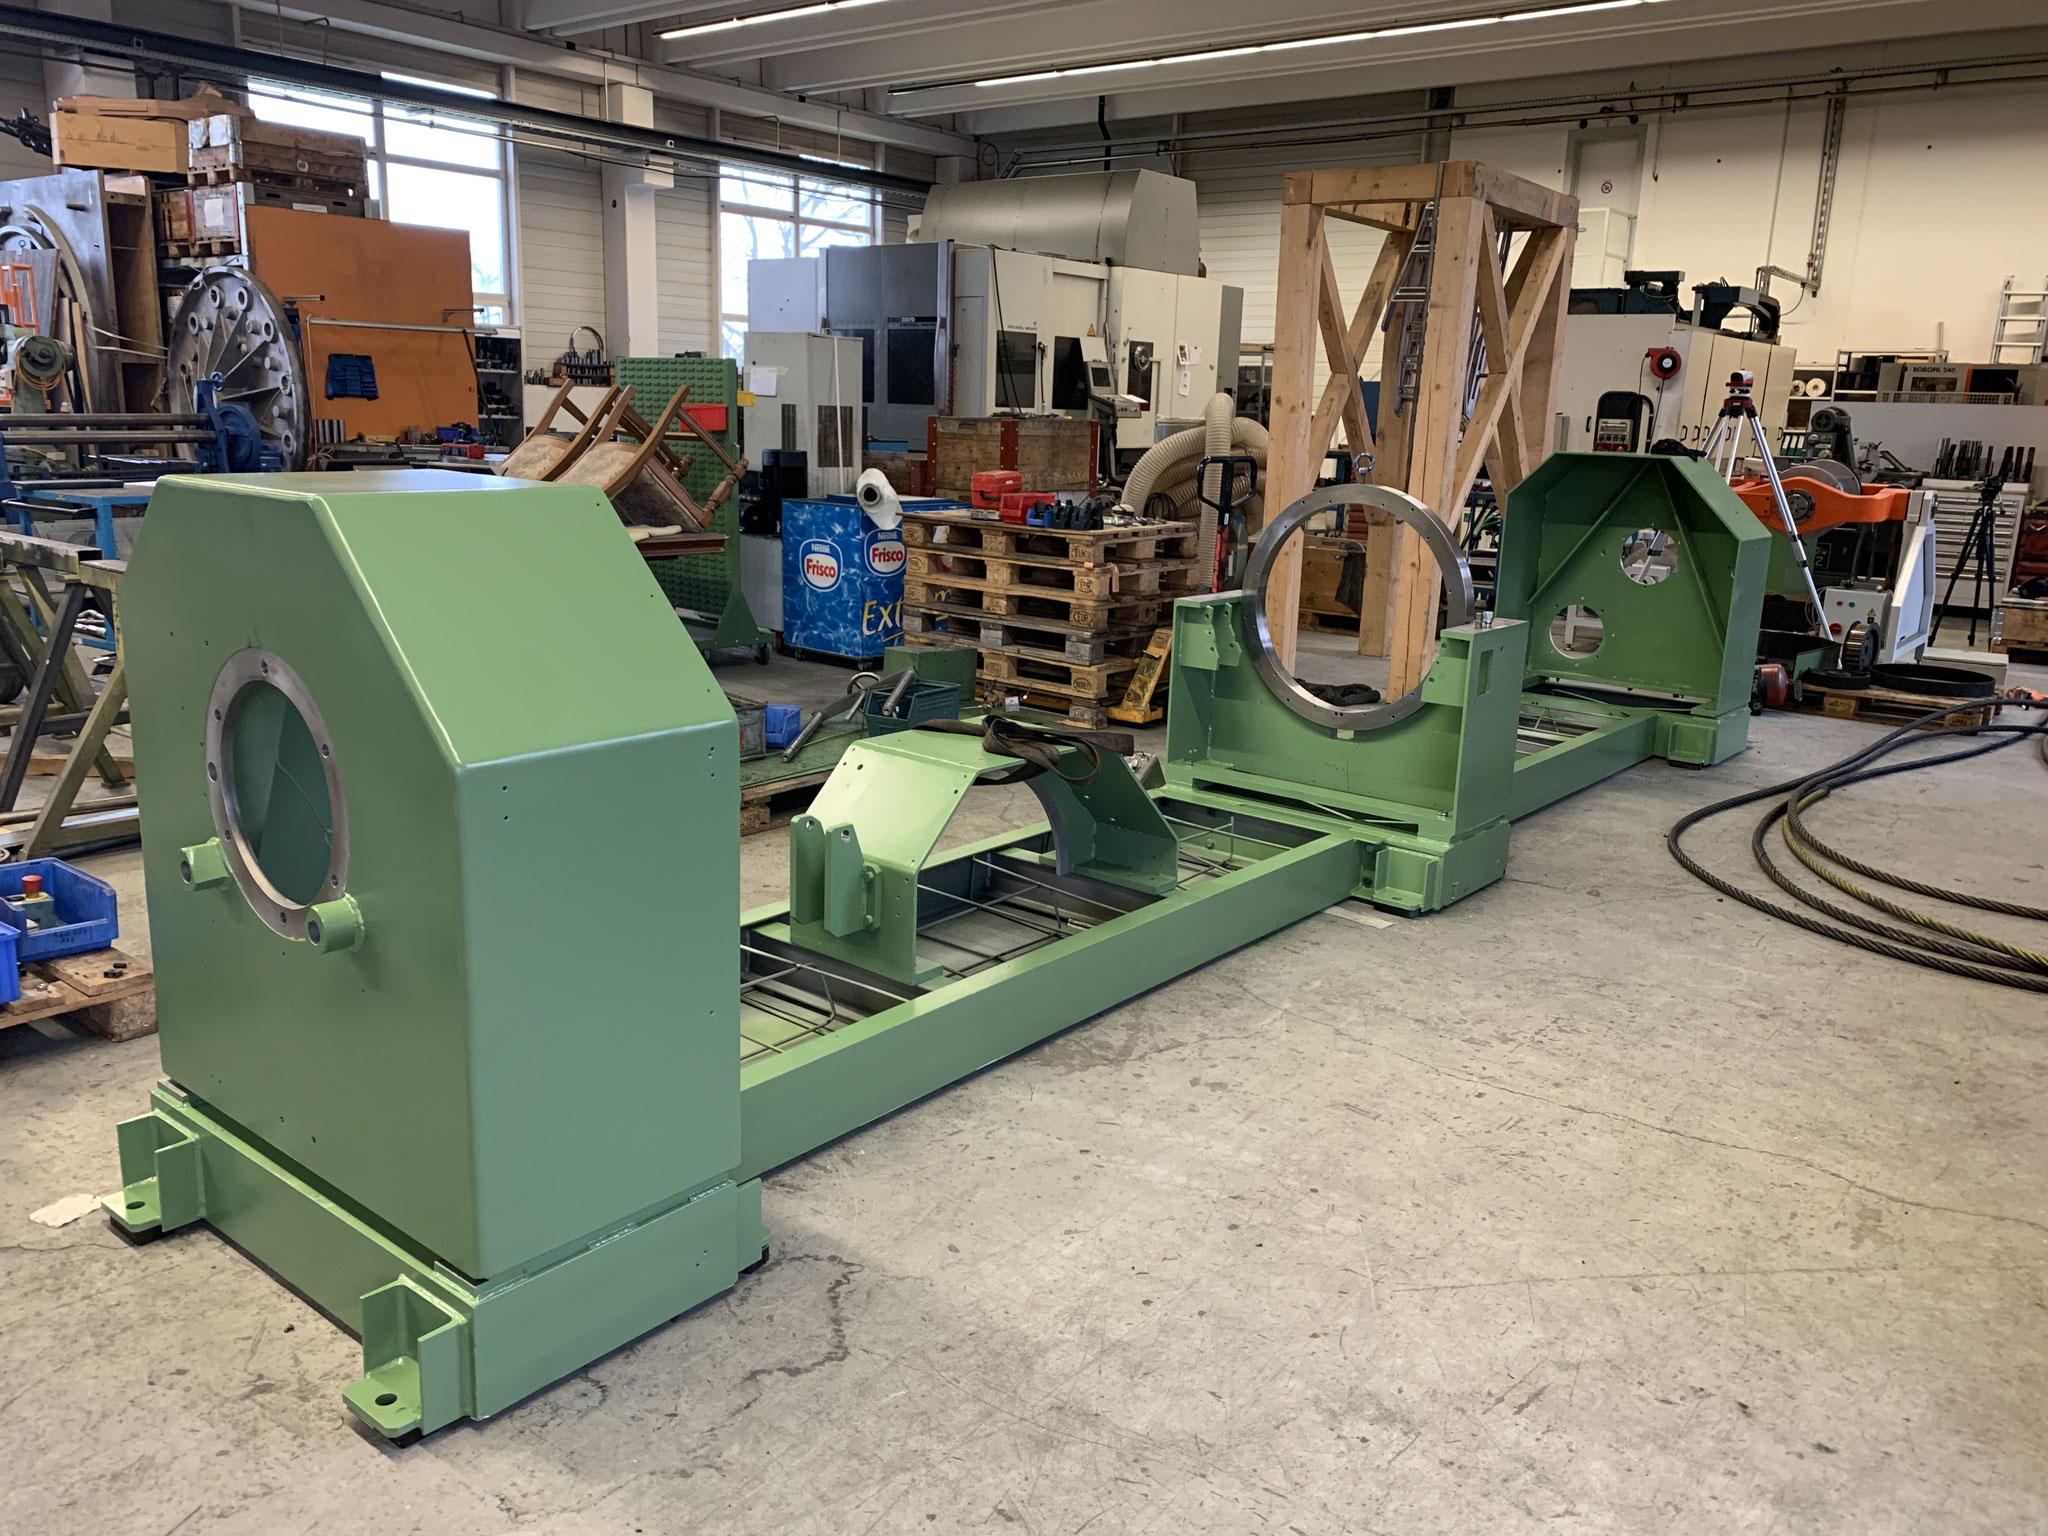 Maschinenrahmen verstärkt und neu lackiert